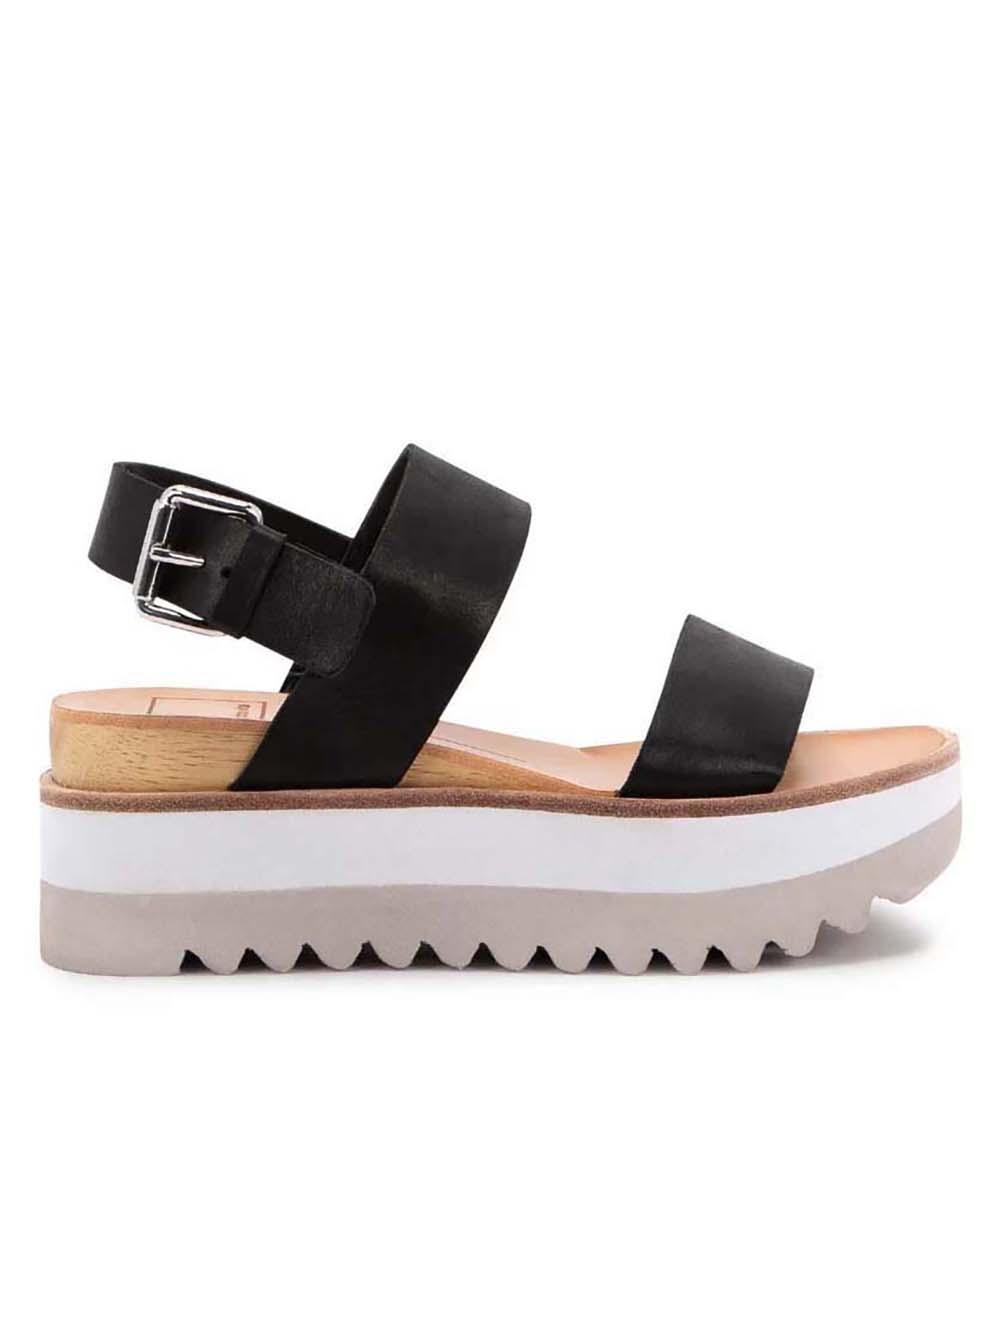 Moxie Platform Slingback Sandal